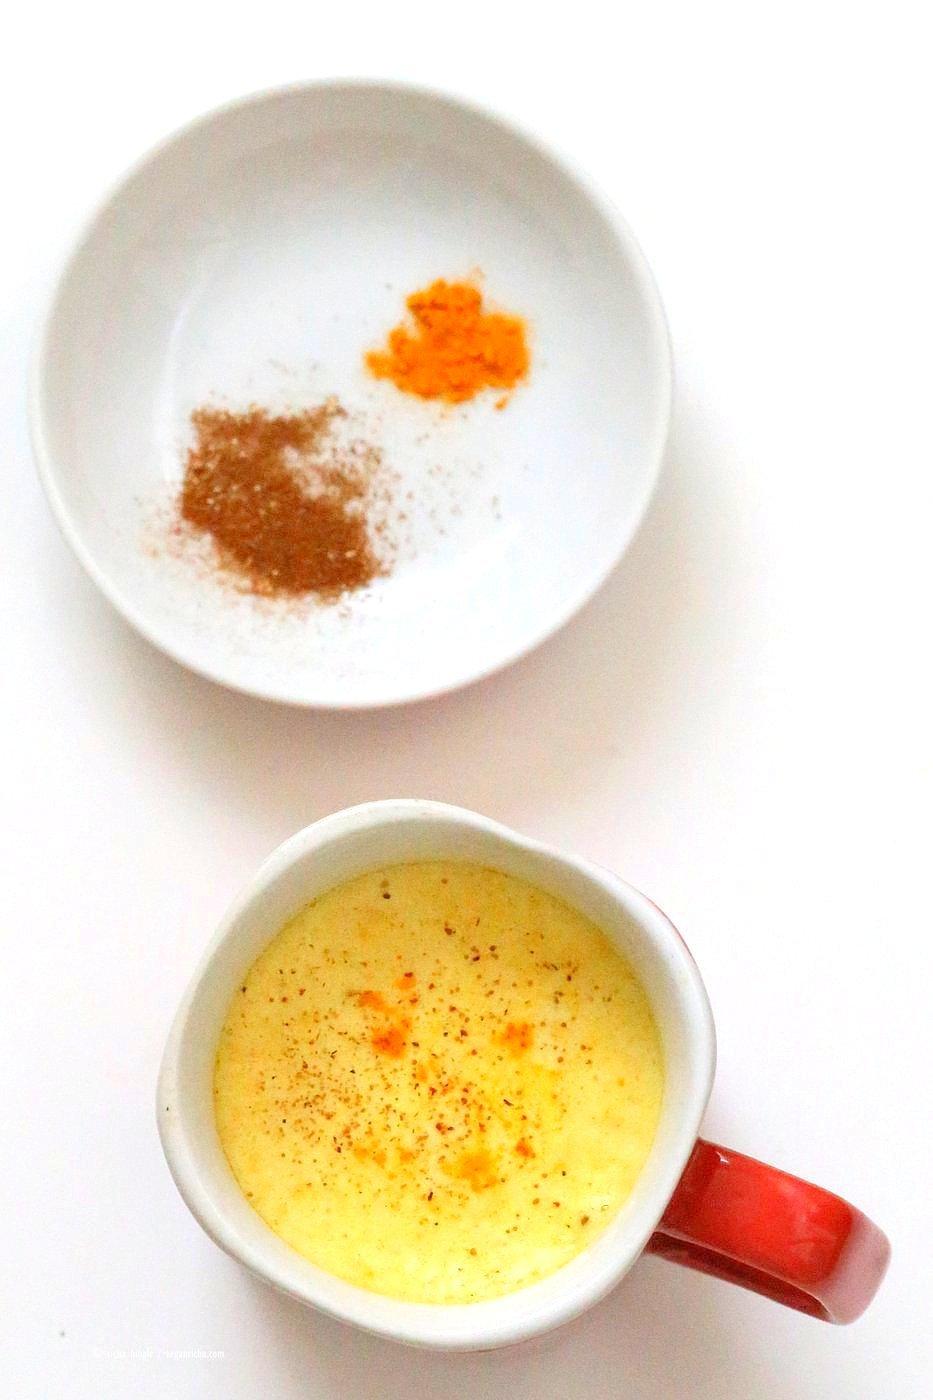 Pumpkin Pie Spice Turmeric Latte. Warming comforting latte with pumpkin pie spices and turmeric. Ready in 10 minutes. Vegan Gluten-free Recipe | VeganRicha.com